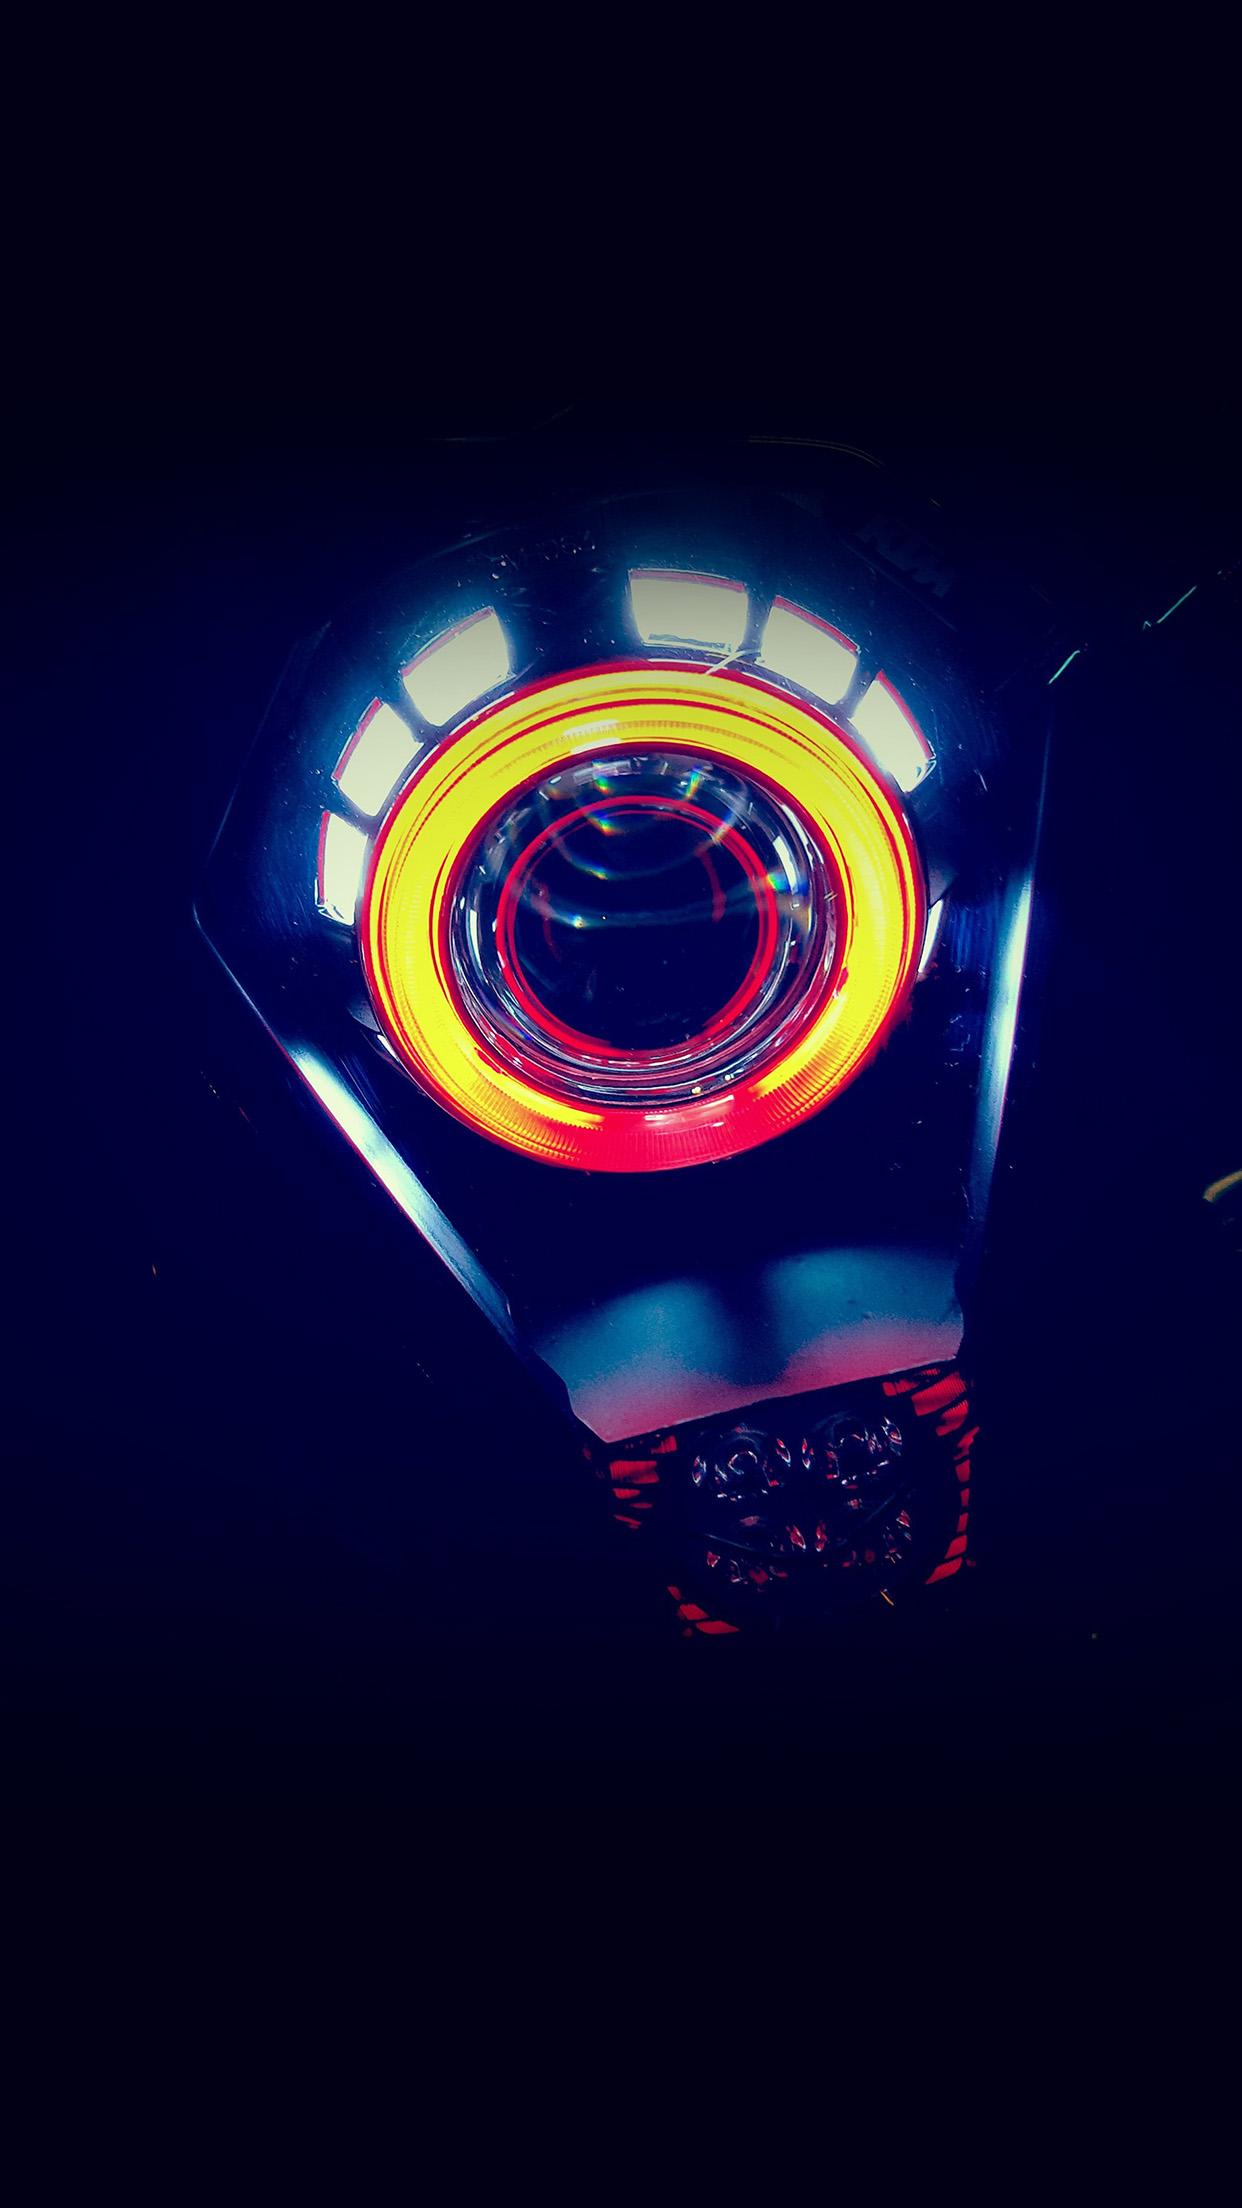 Dark Light Abstract Art - HD Wallpaper